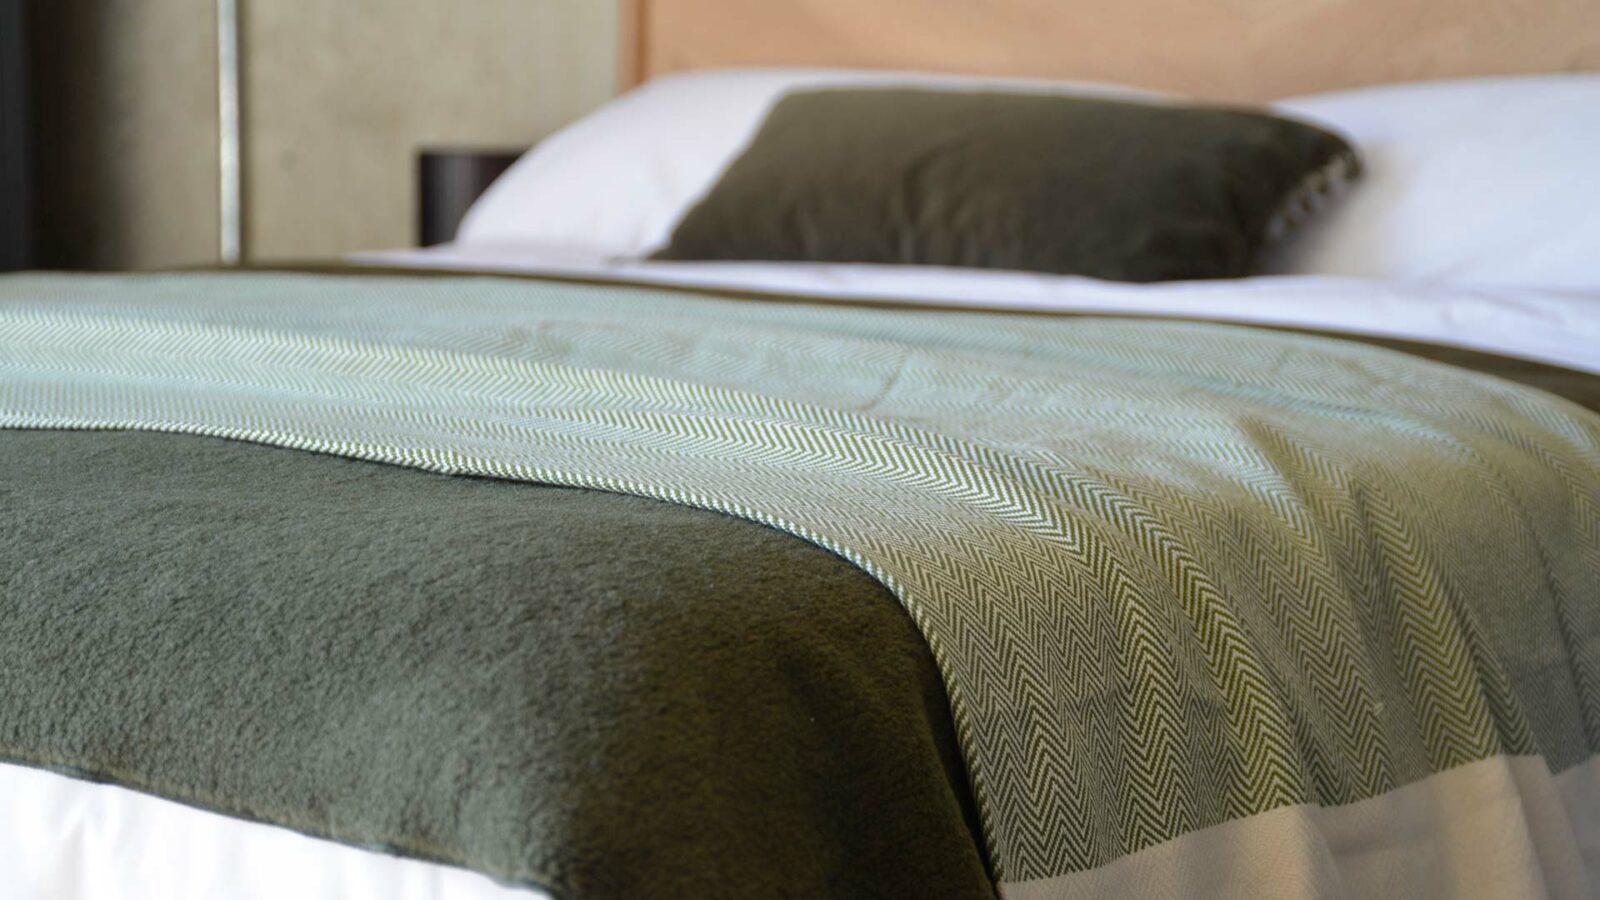 OEKO TEX certified woven cotton blanket with herringbone weave in olive green and cream